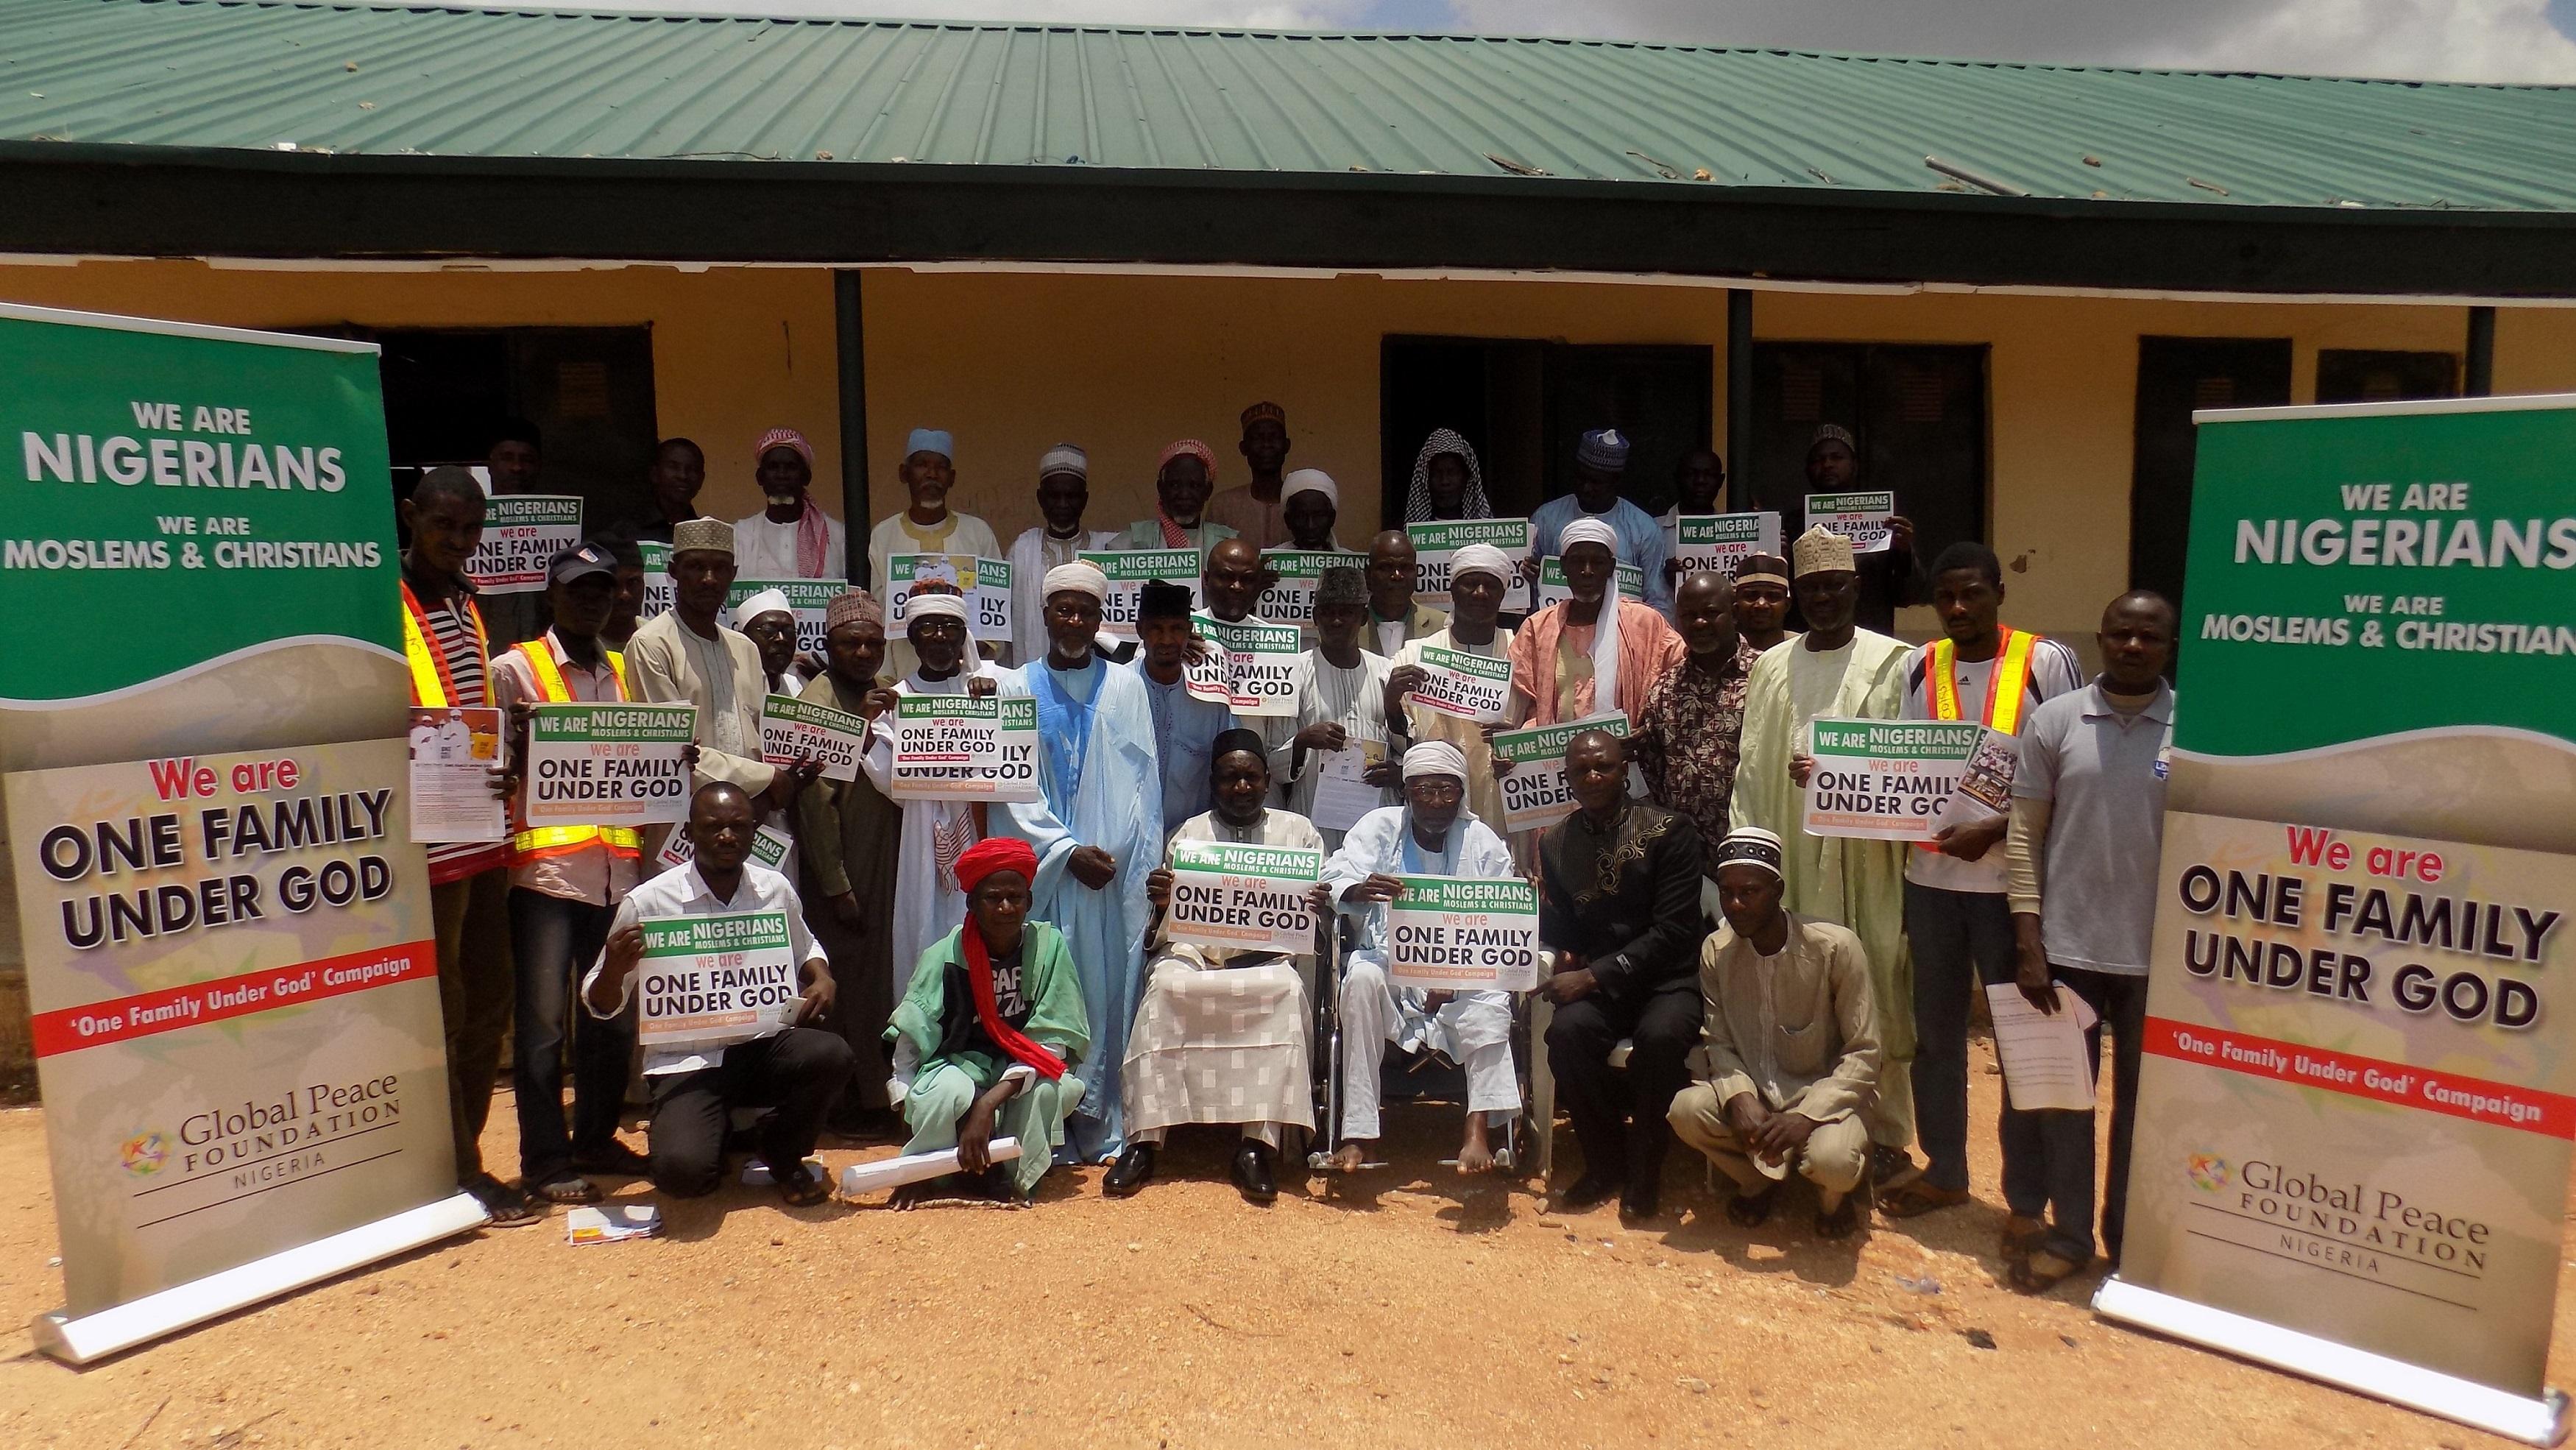 Nigerian Cross Society Or First Kaduna State